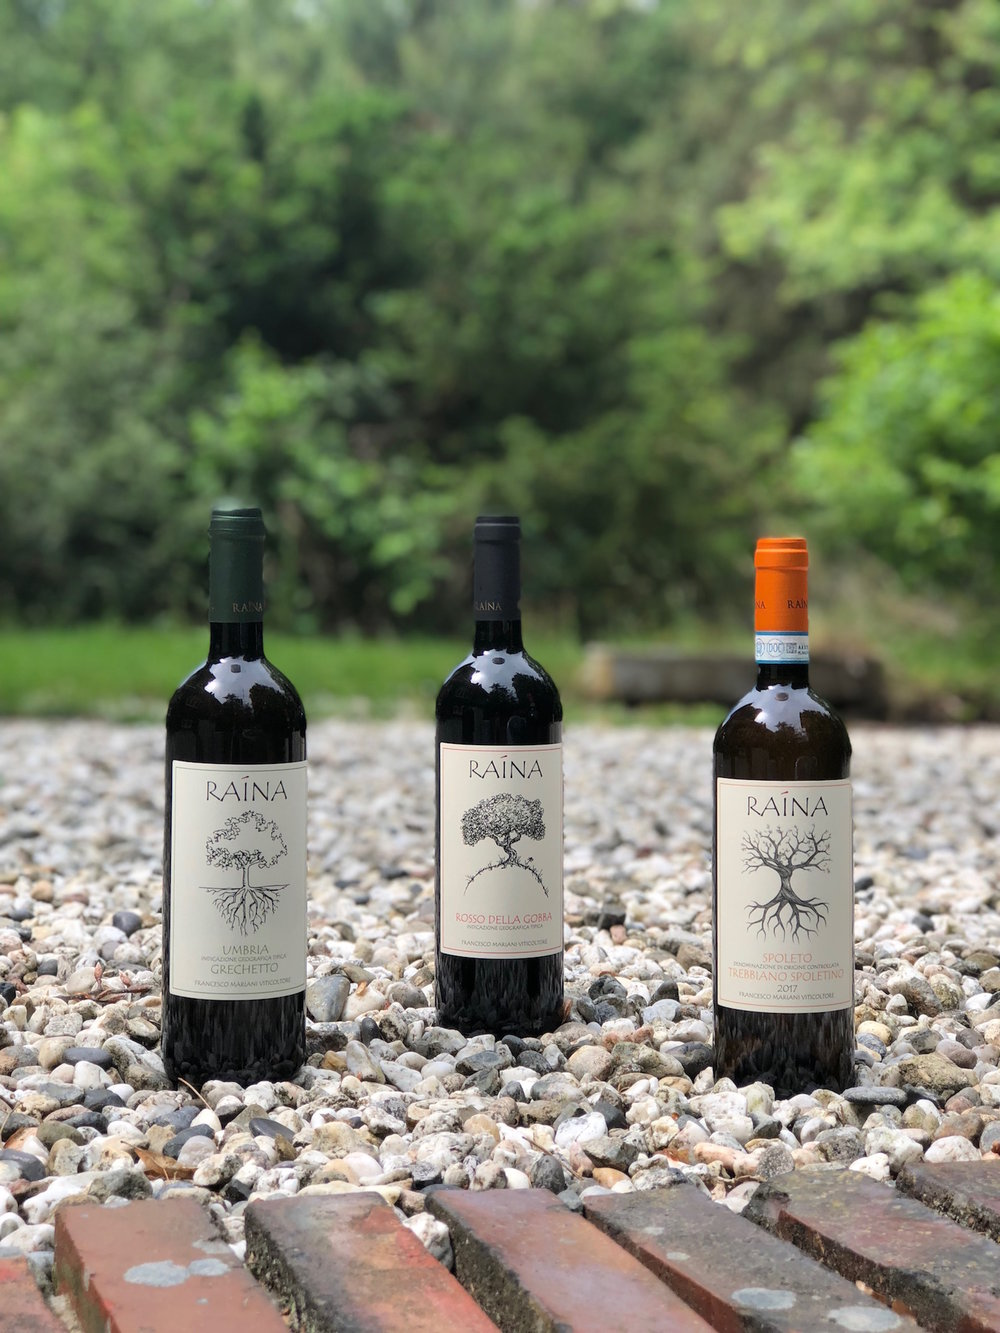 Raina wijnen